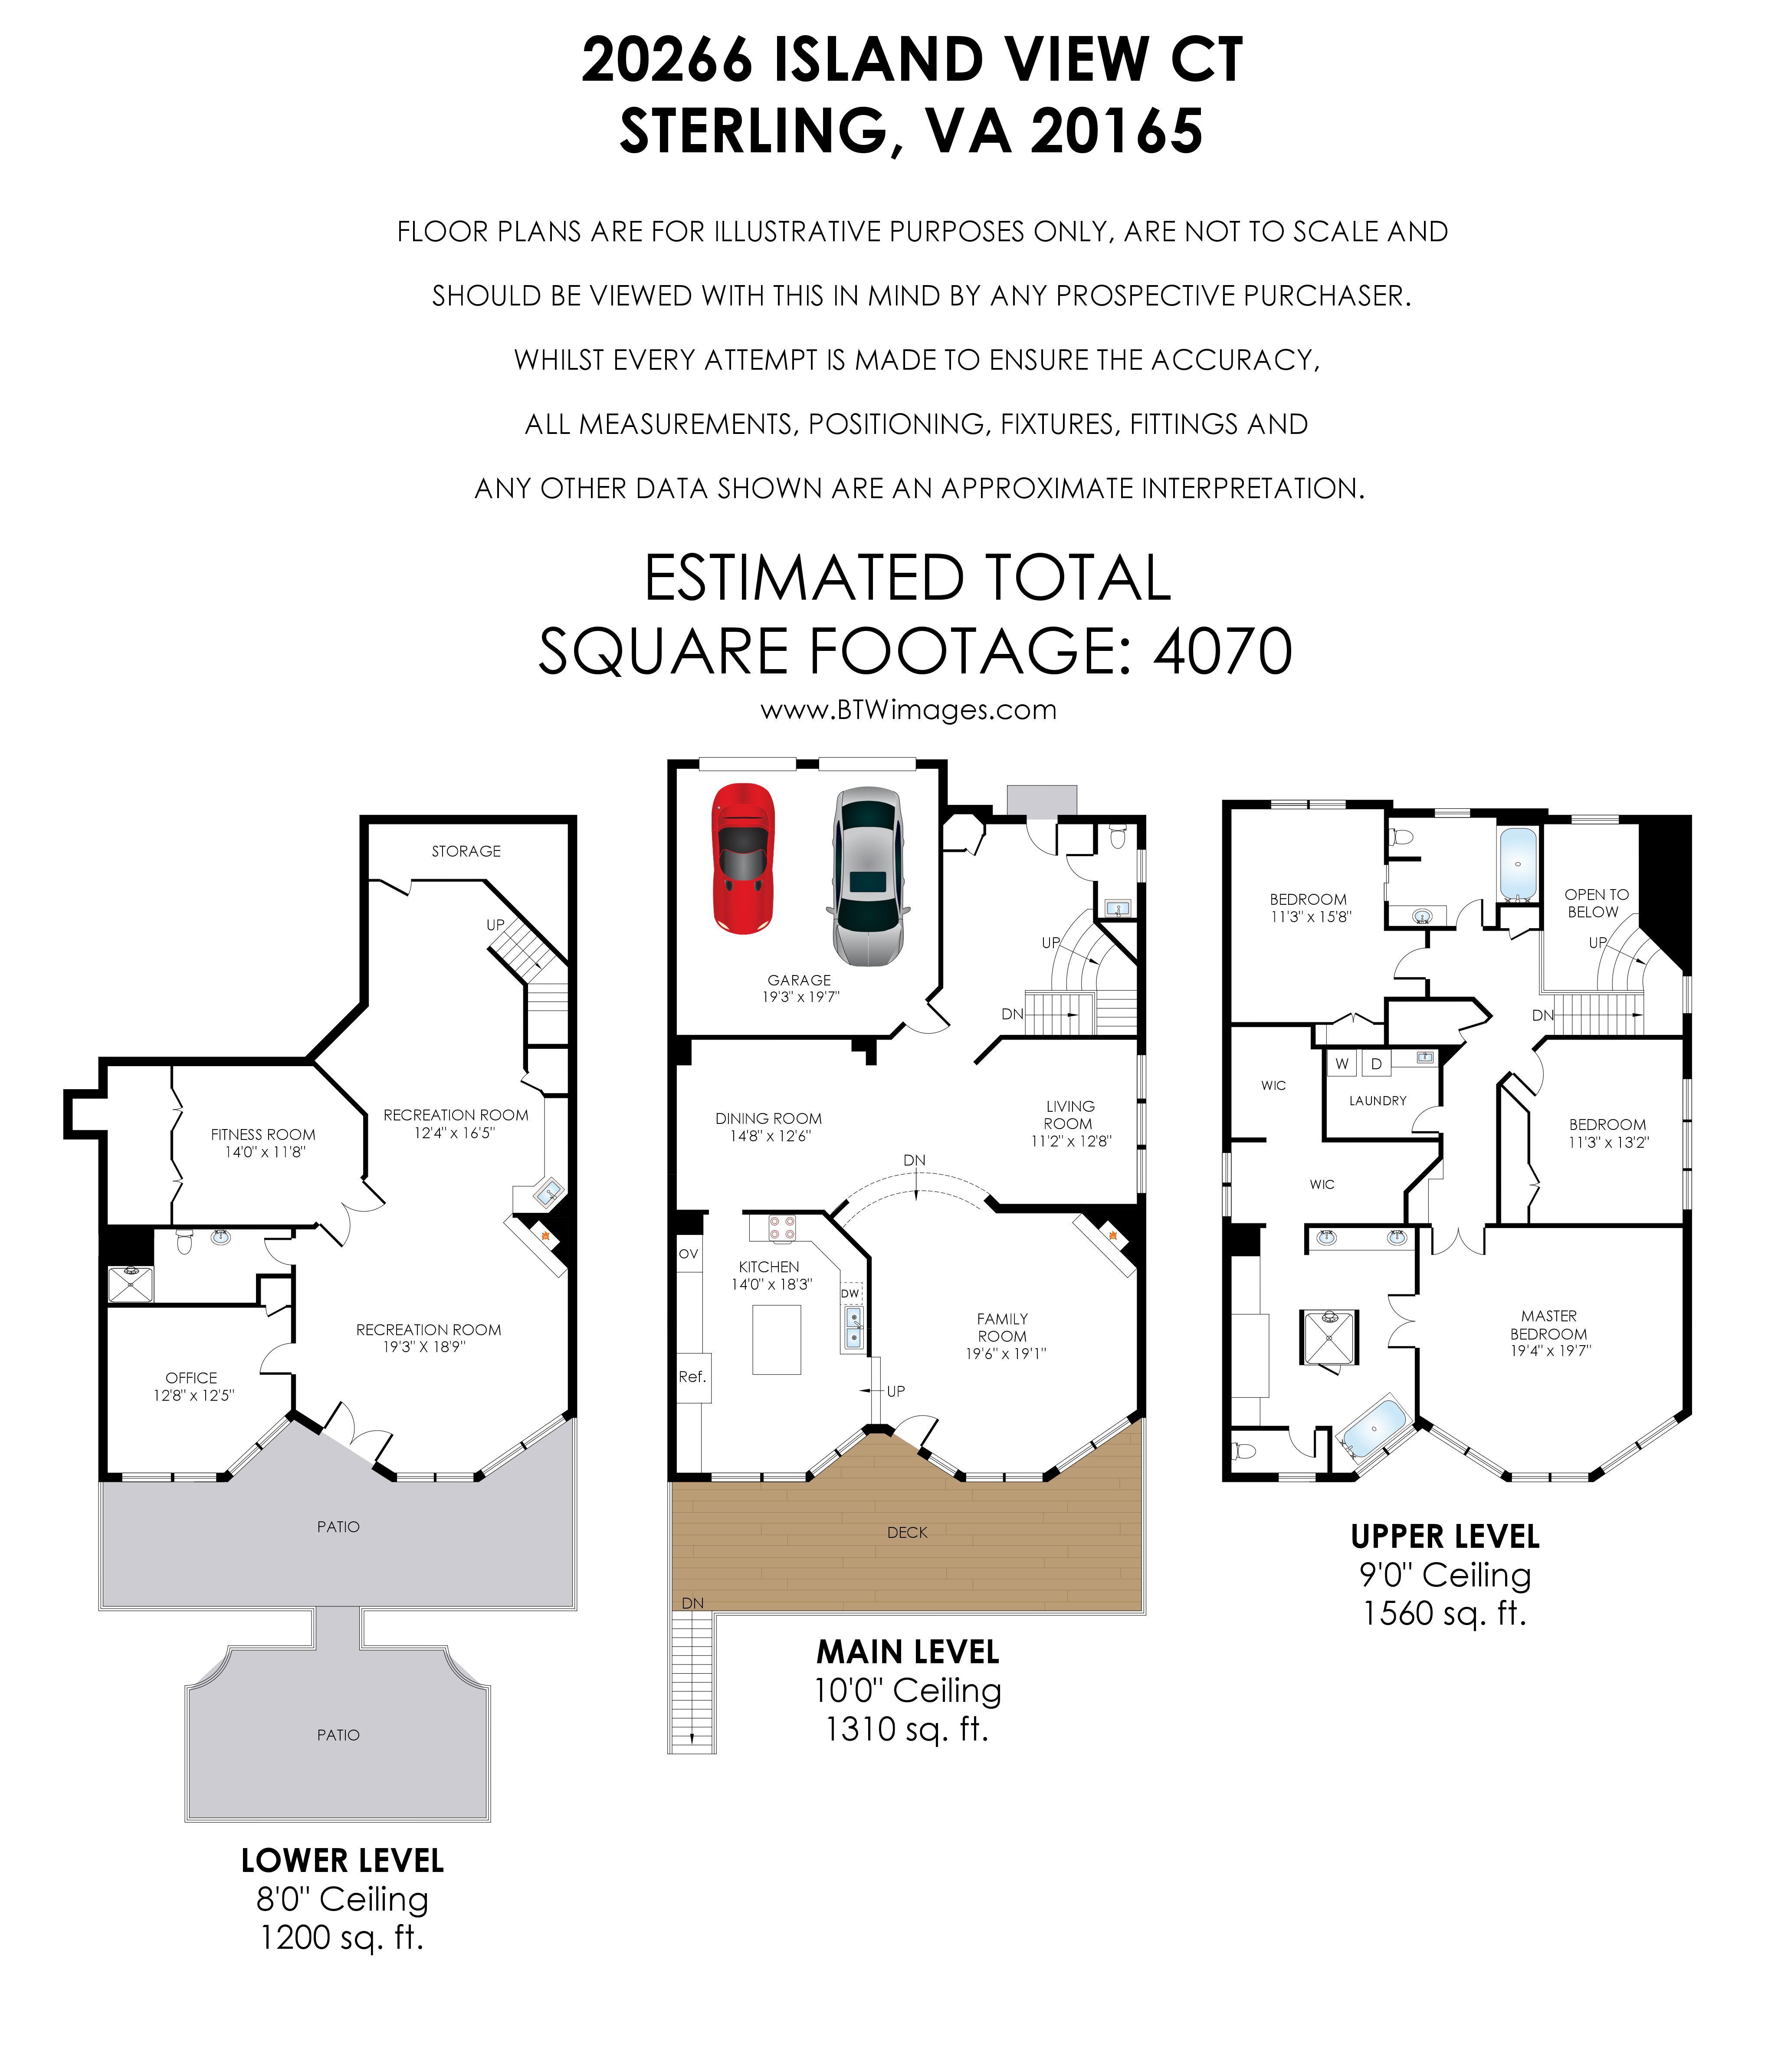 20266 Island View_Lowes Island_Floor Plan